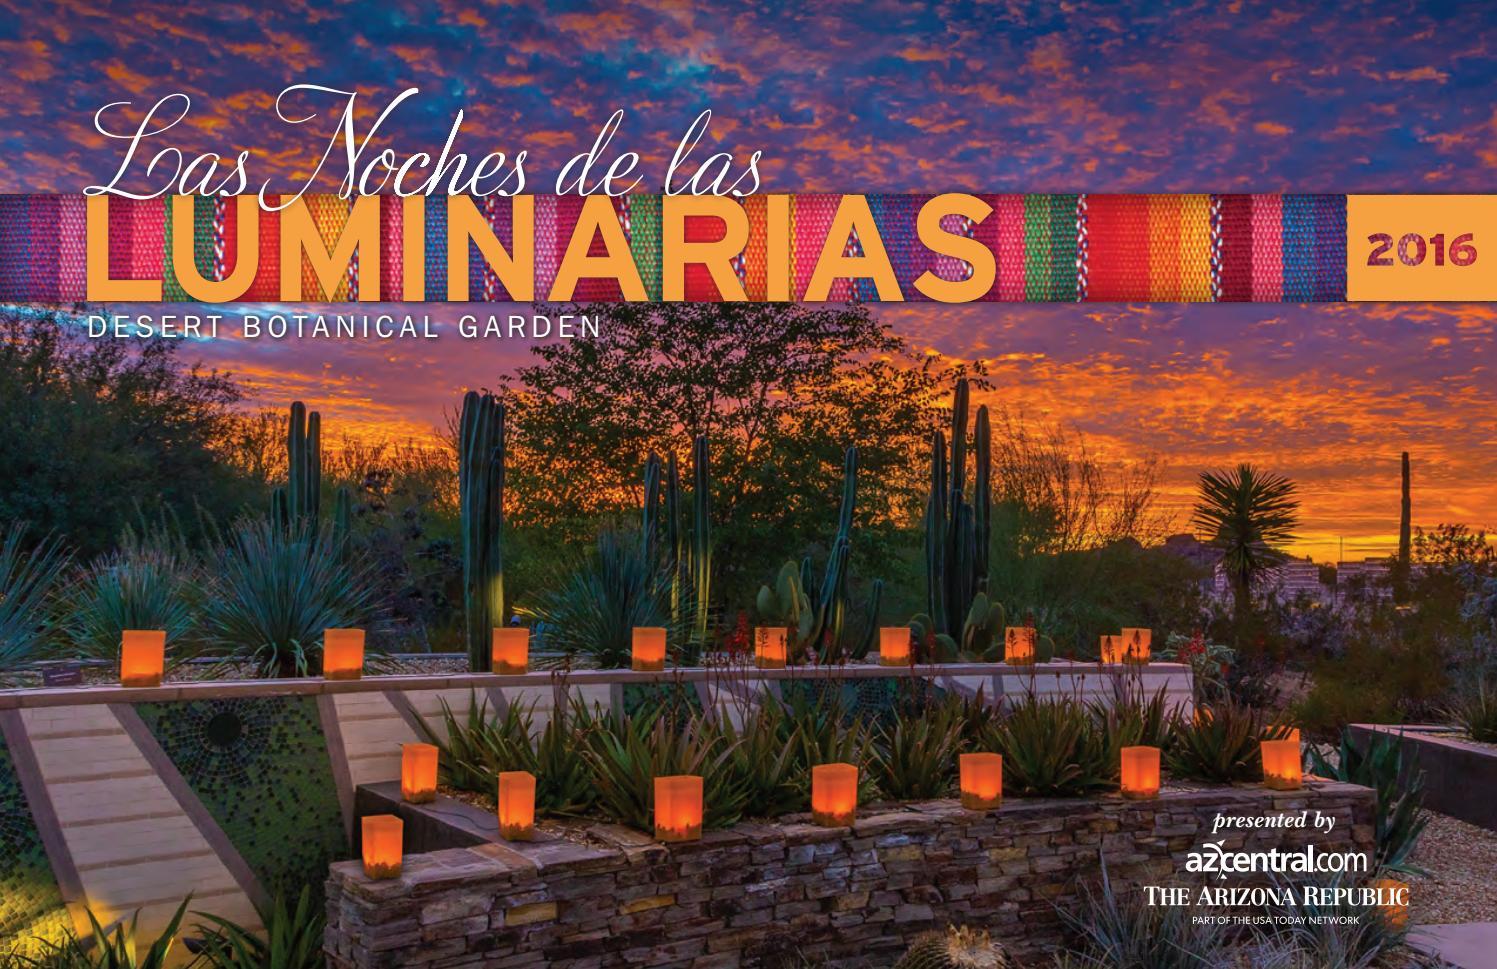 Las Noches De Las Luminarias 2016 Invitation By Desert Botanical Garden Issuu